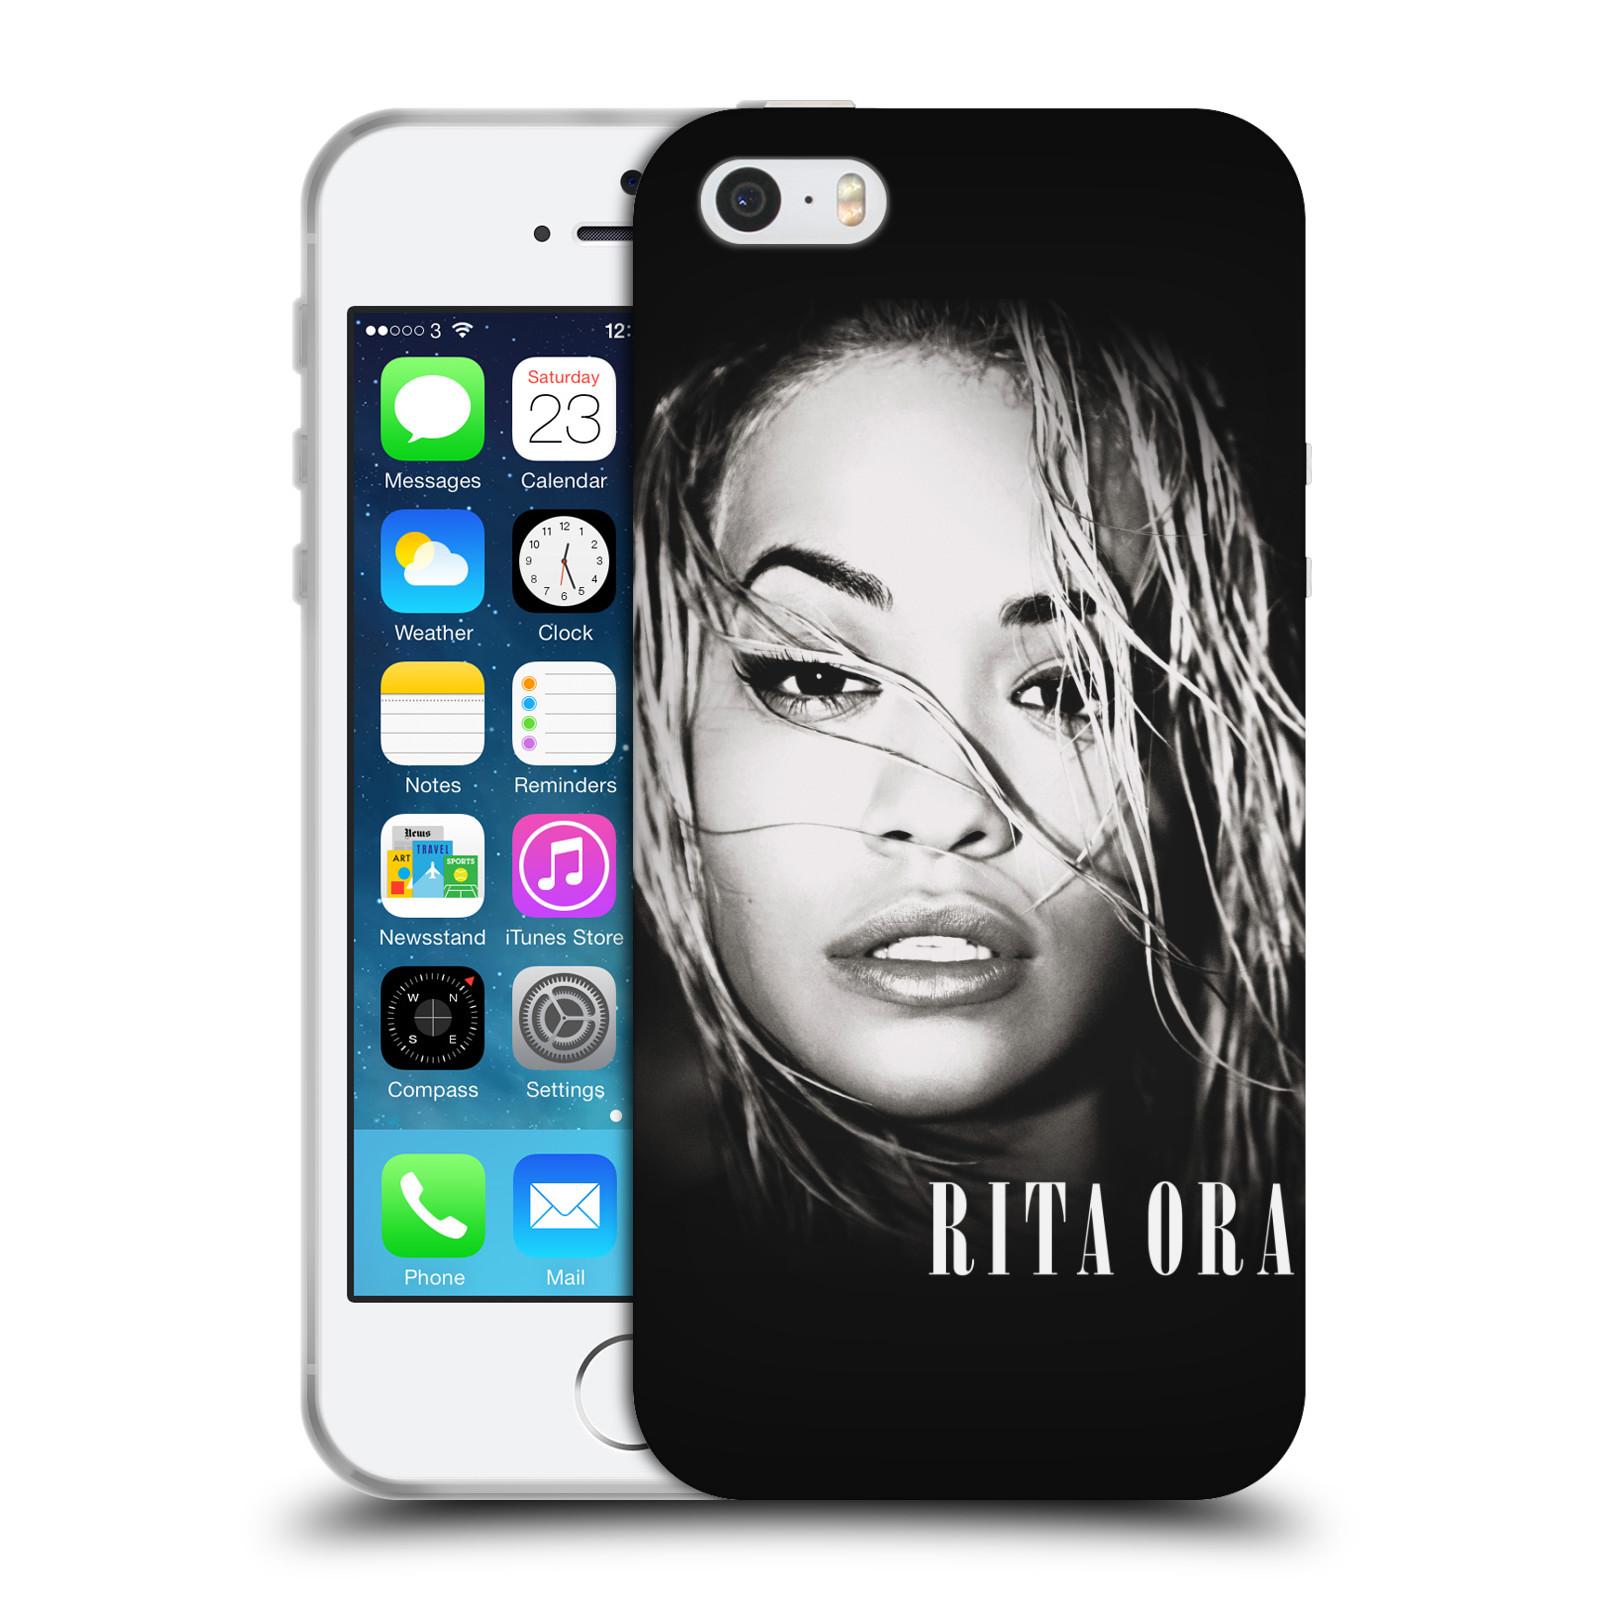 HEAD CASE silikonový obal na mobil Apple Iphone 5/5S zpěvačka Rita Ora foto tvář